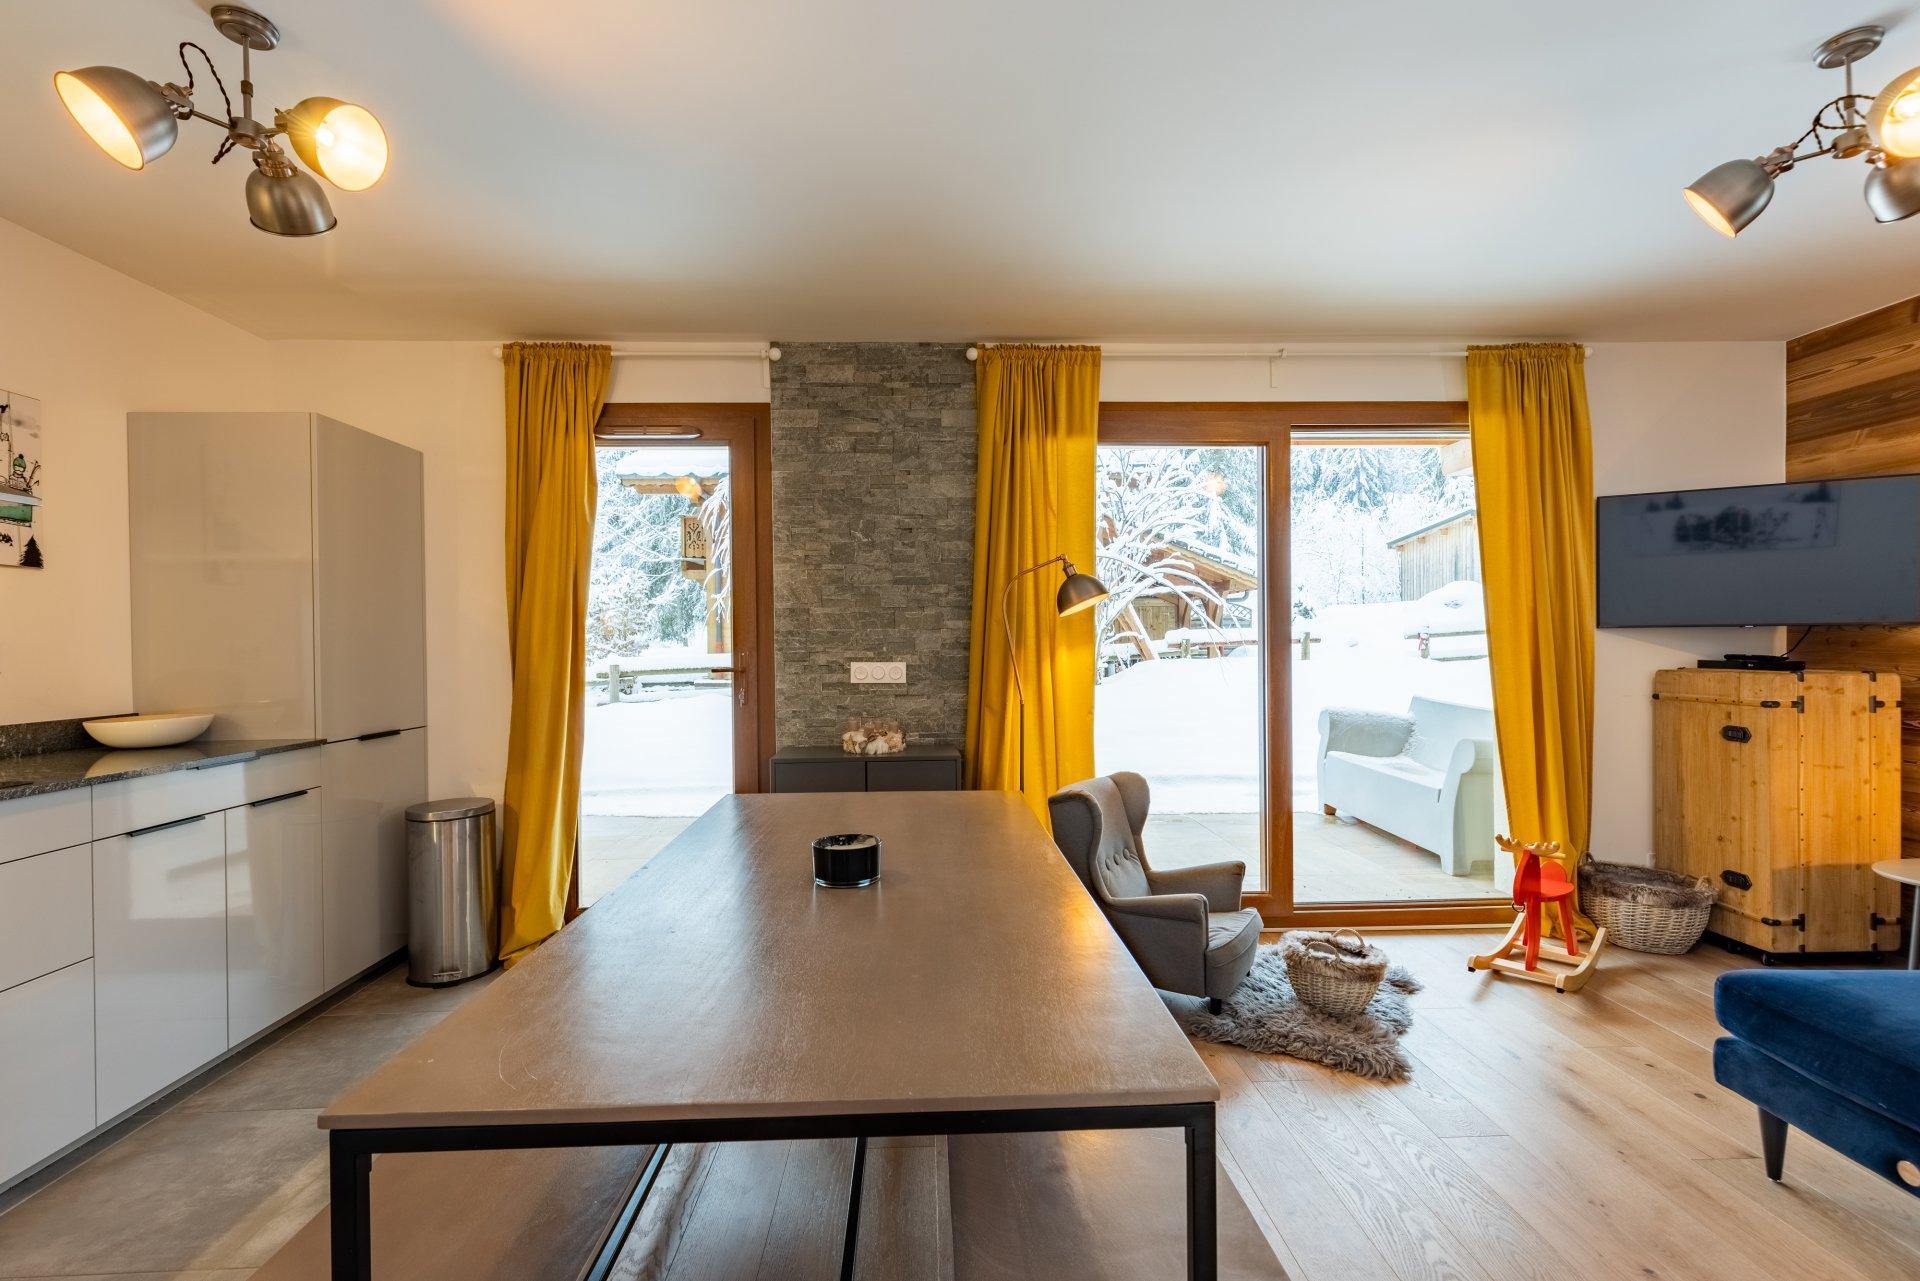 Rental apartment: Newly built 2 bed, 2 bath apartment with terrace near to Prodains Gondola.